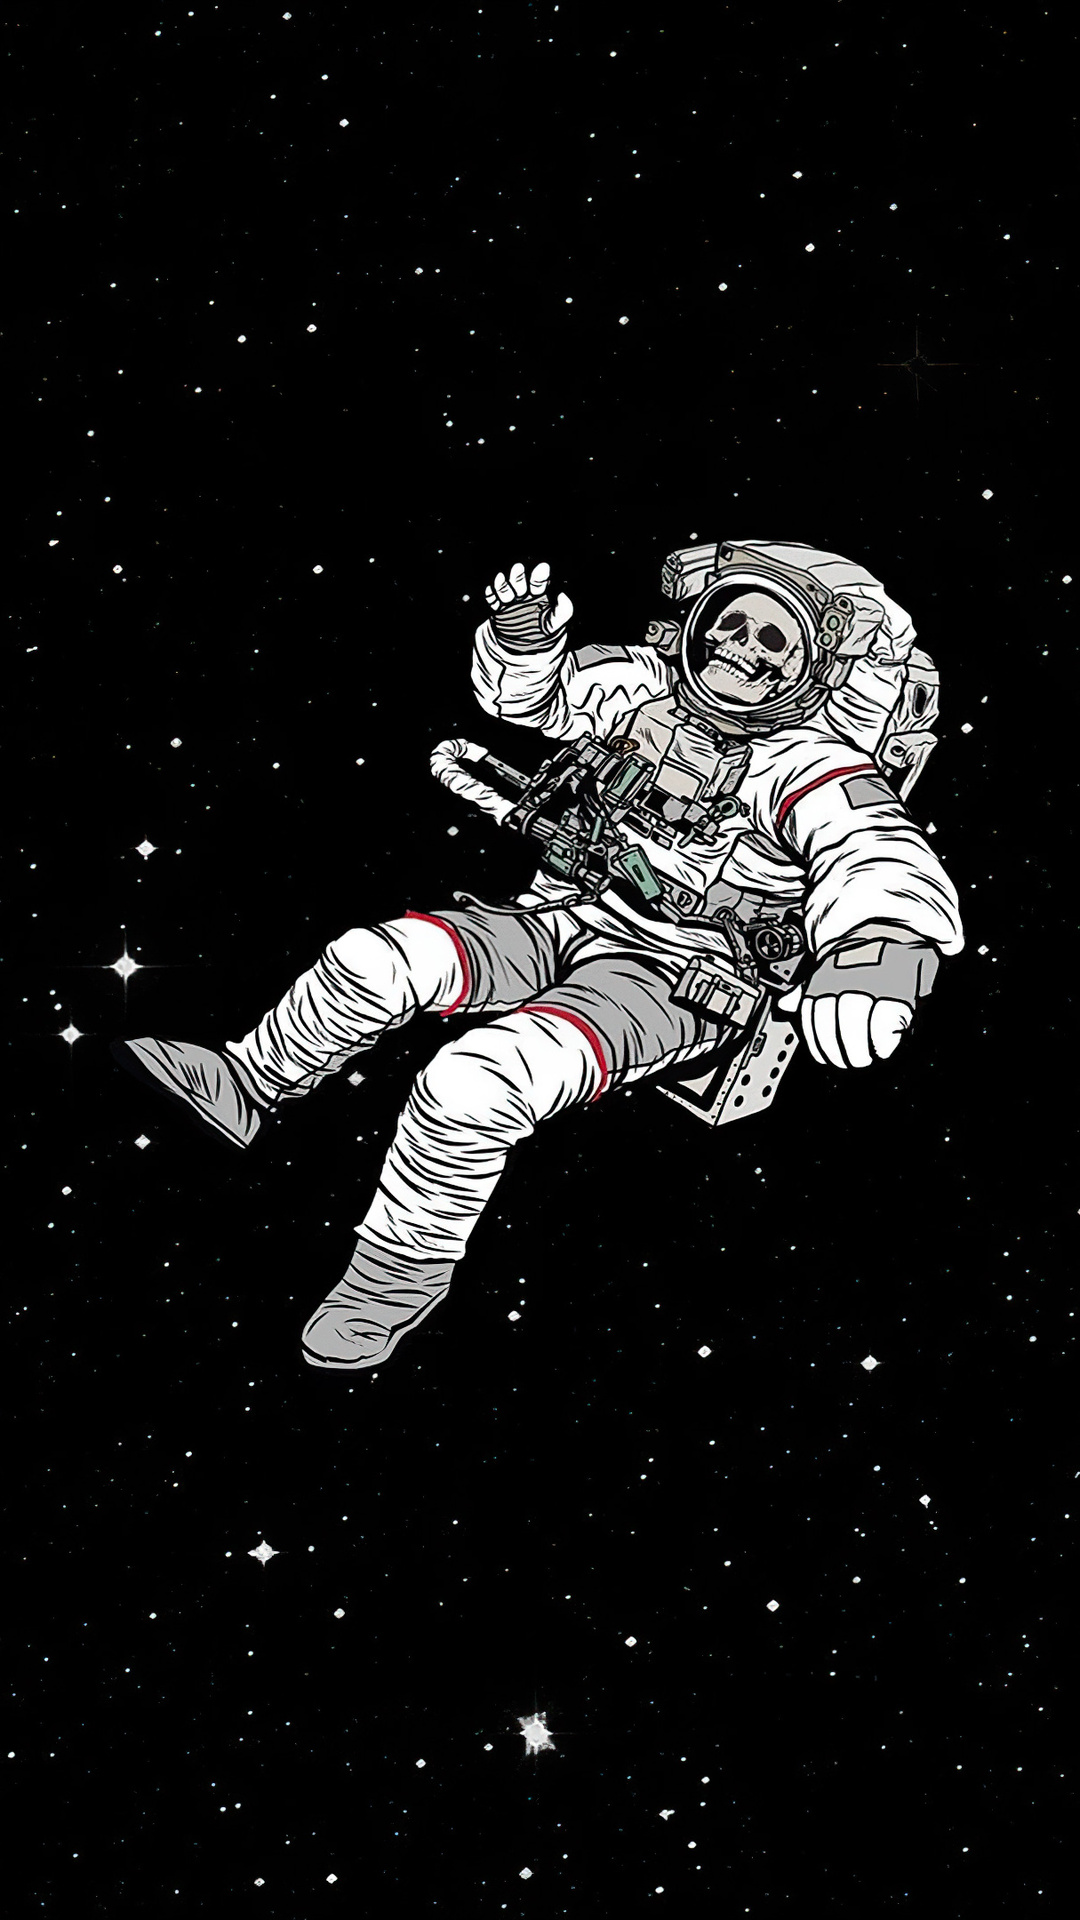 Astronaut Lost In Infinite Space Wallpaper